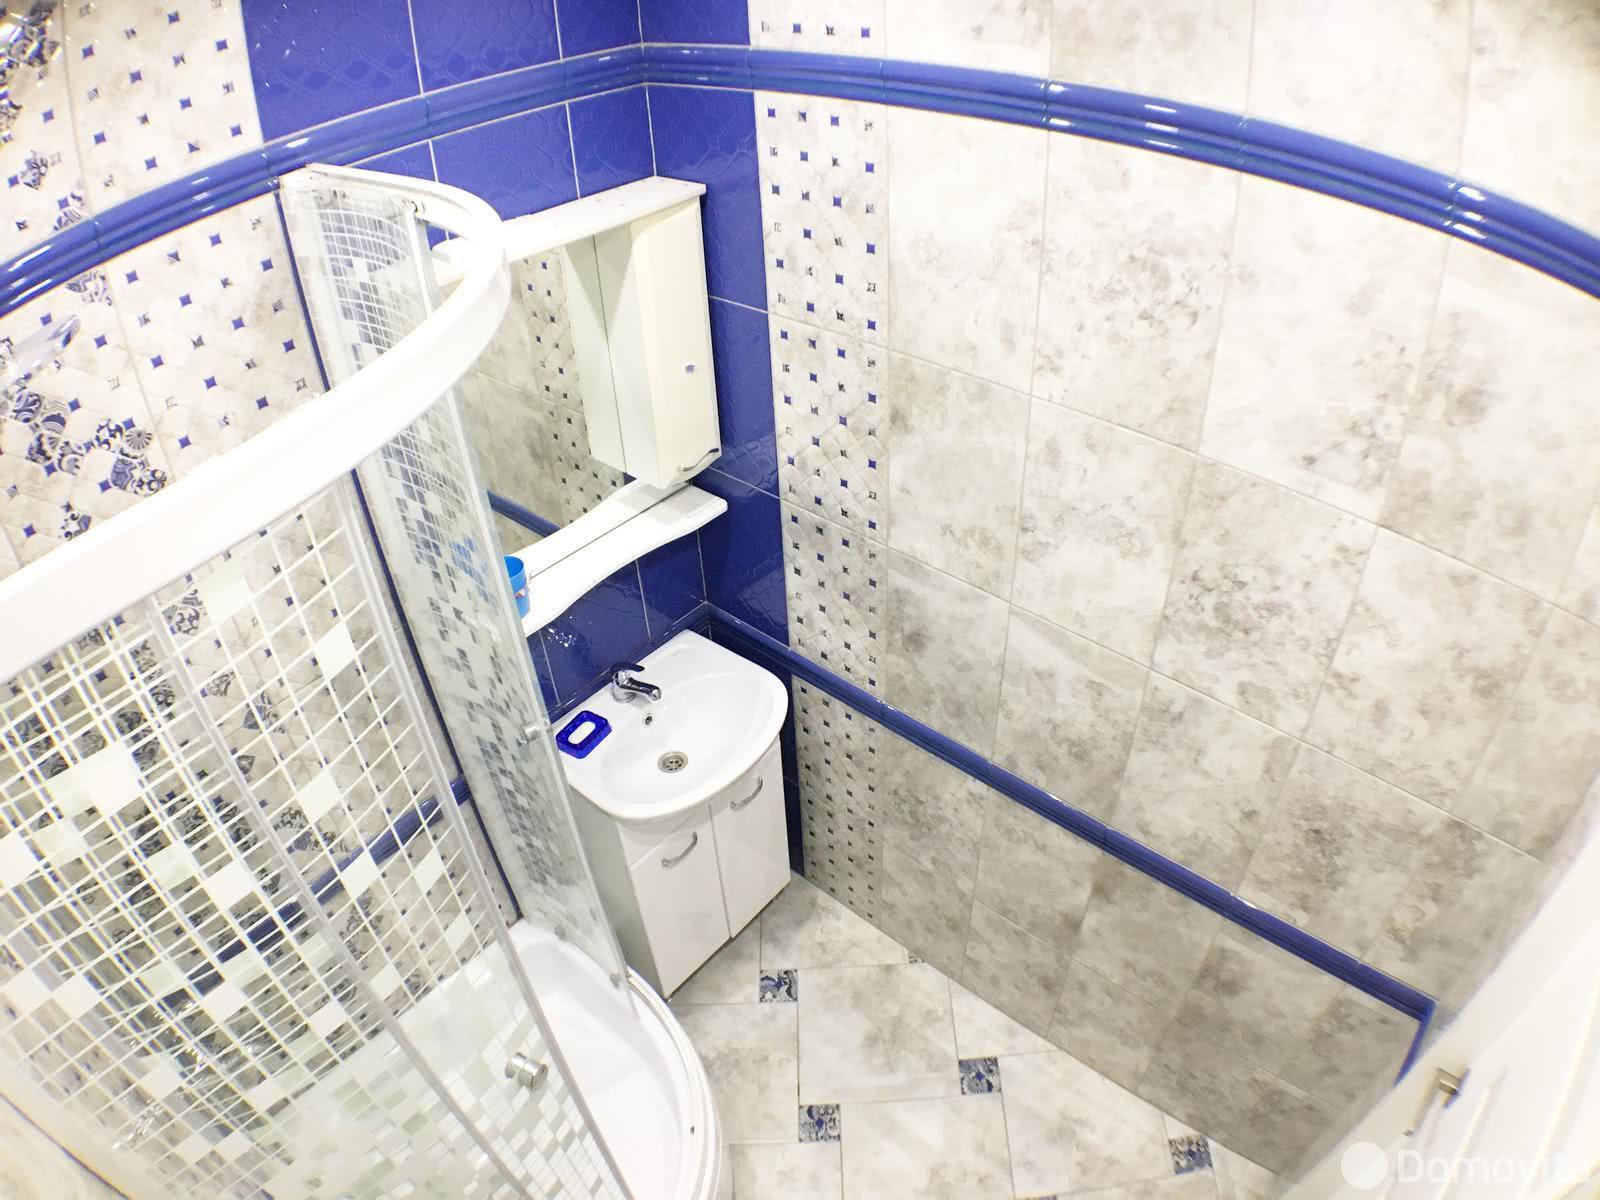 Аренда 1-комнатной квартиры на сутки в Минске, ул. Веры Хоружей, д. 5 - фото 5